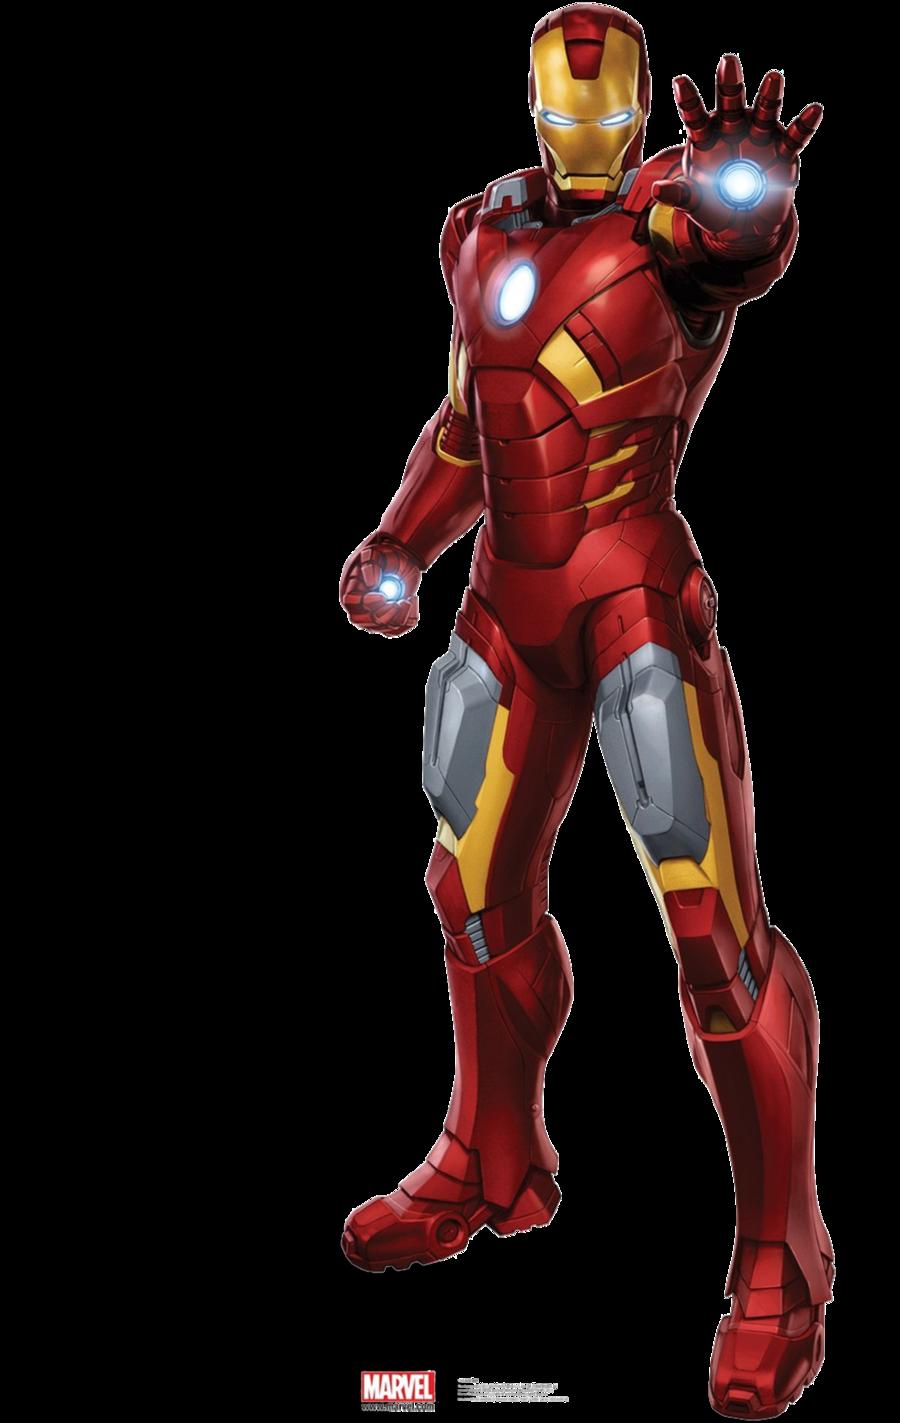 Ironman png images free. Superheroes clipart iron man cartoon